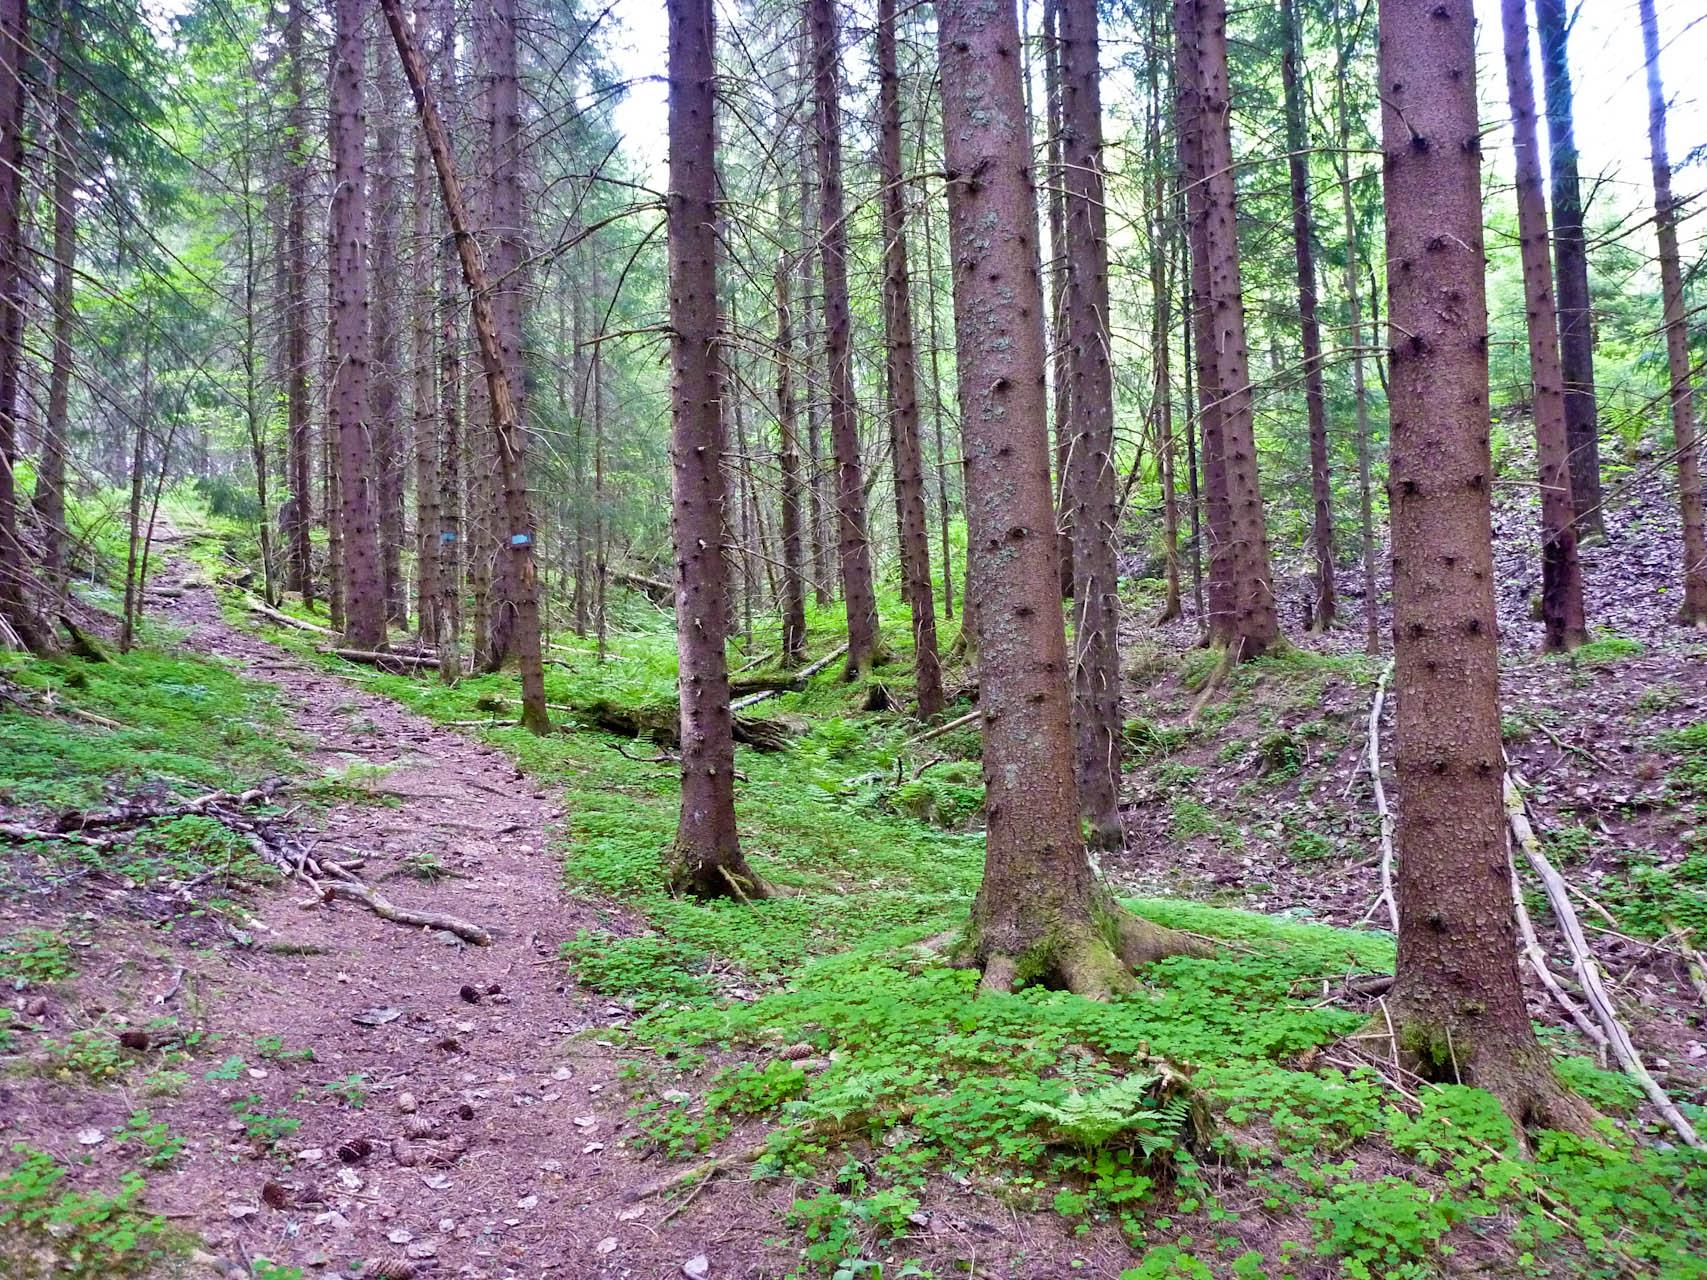 Gammel granskog på Krokskogen